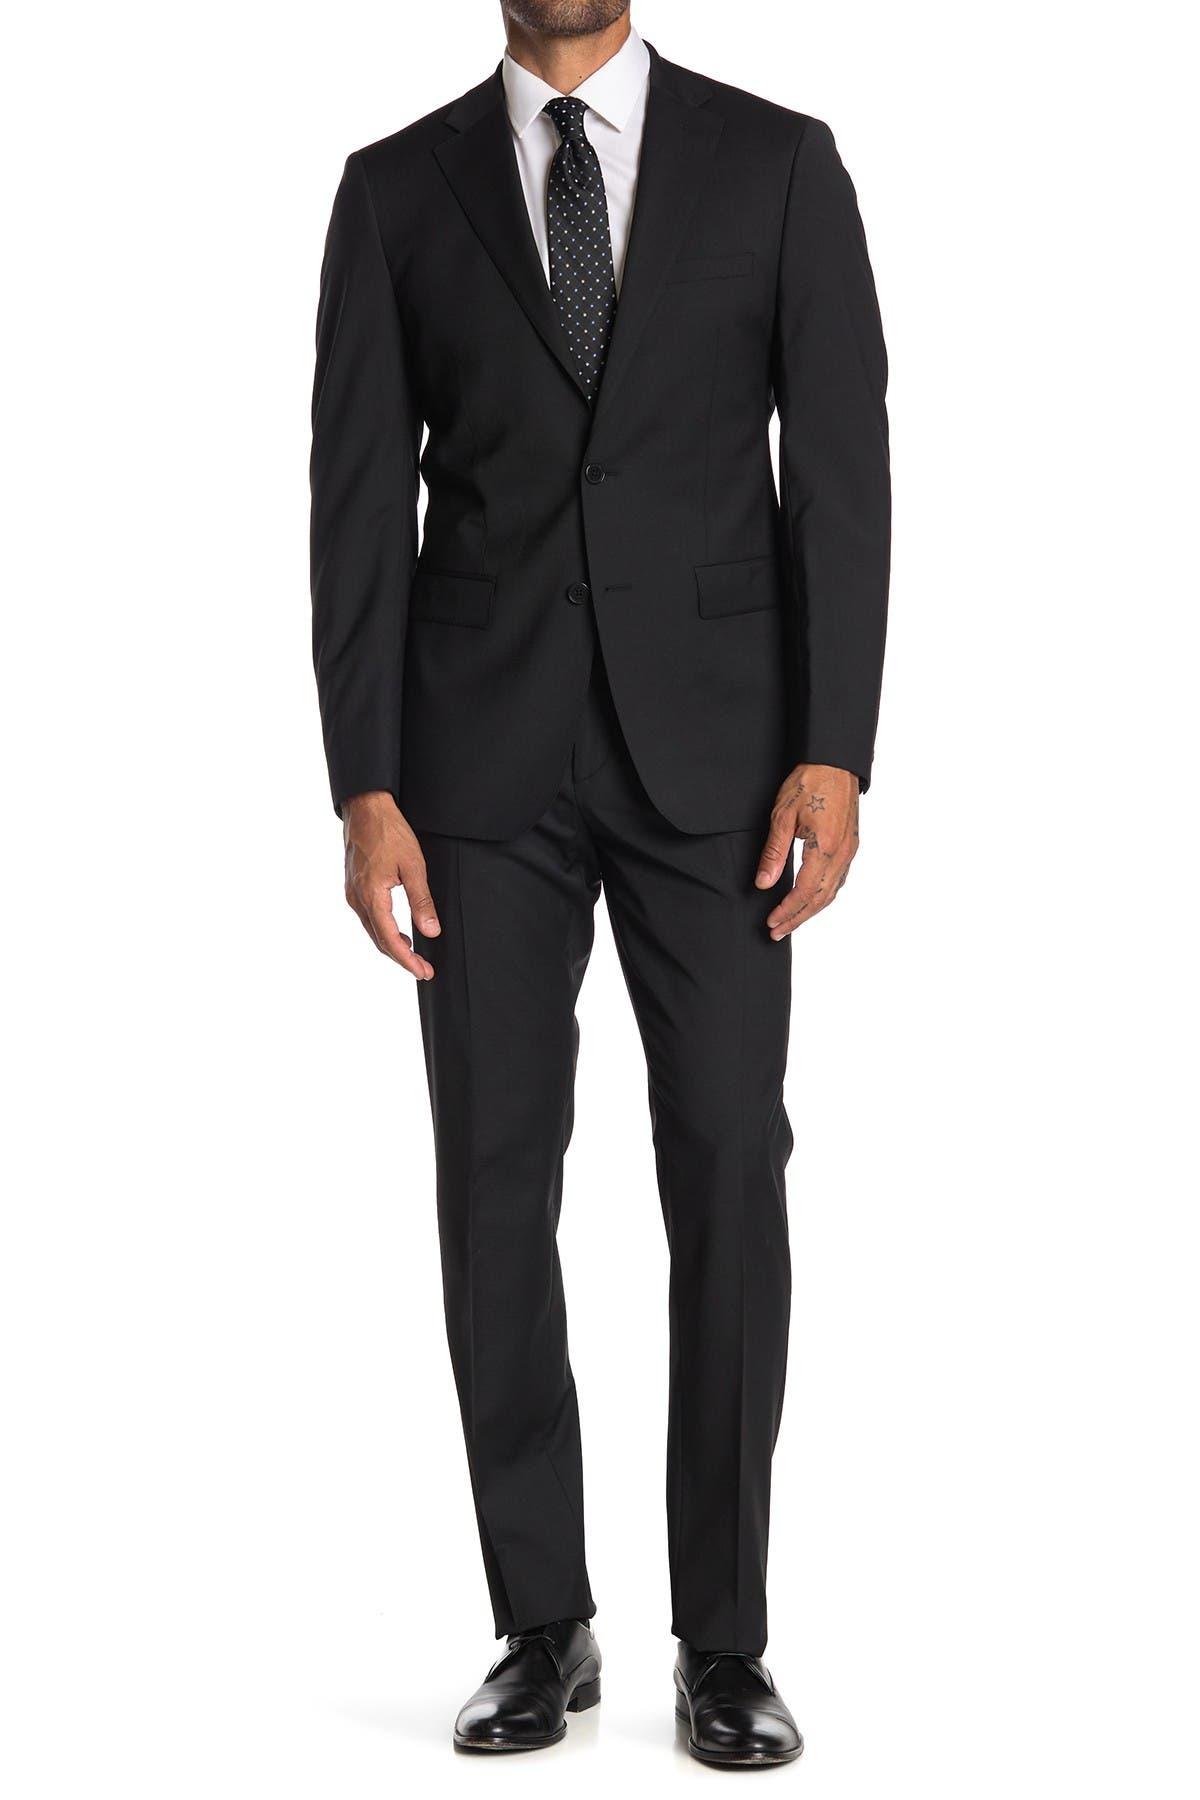 Image of Calvin Klein Solid Black Two Button Notch Lapel Suit